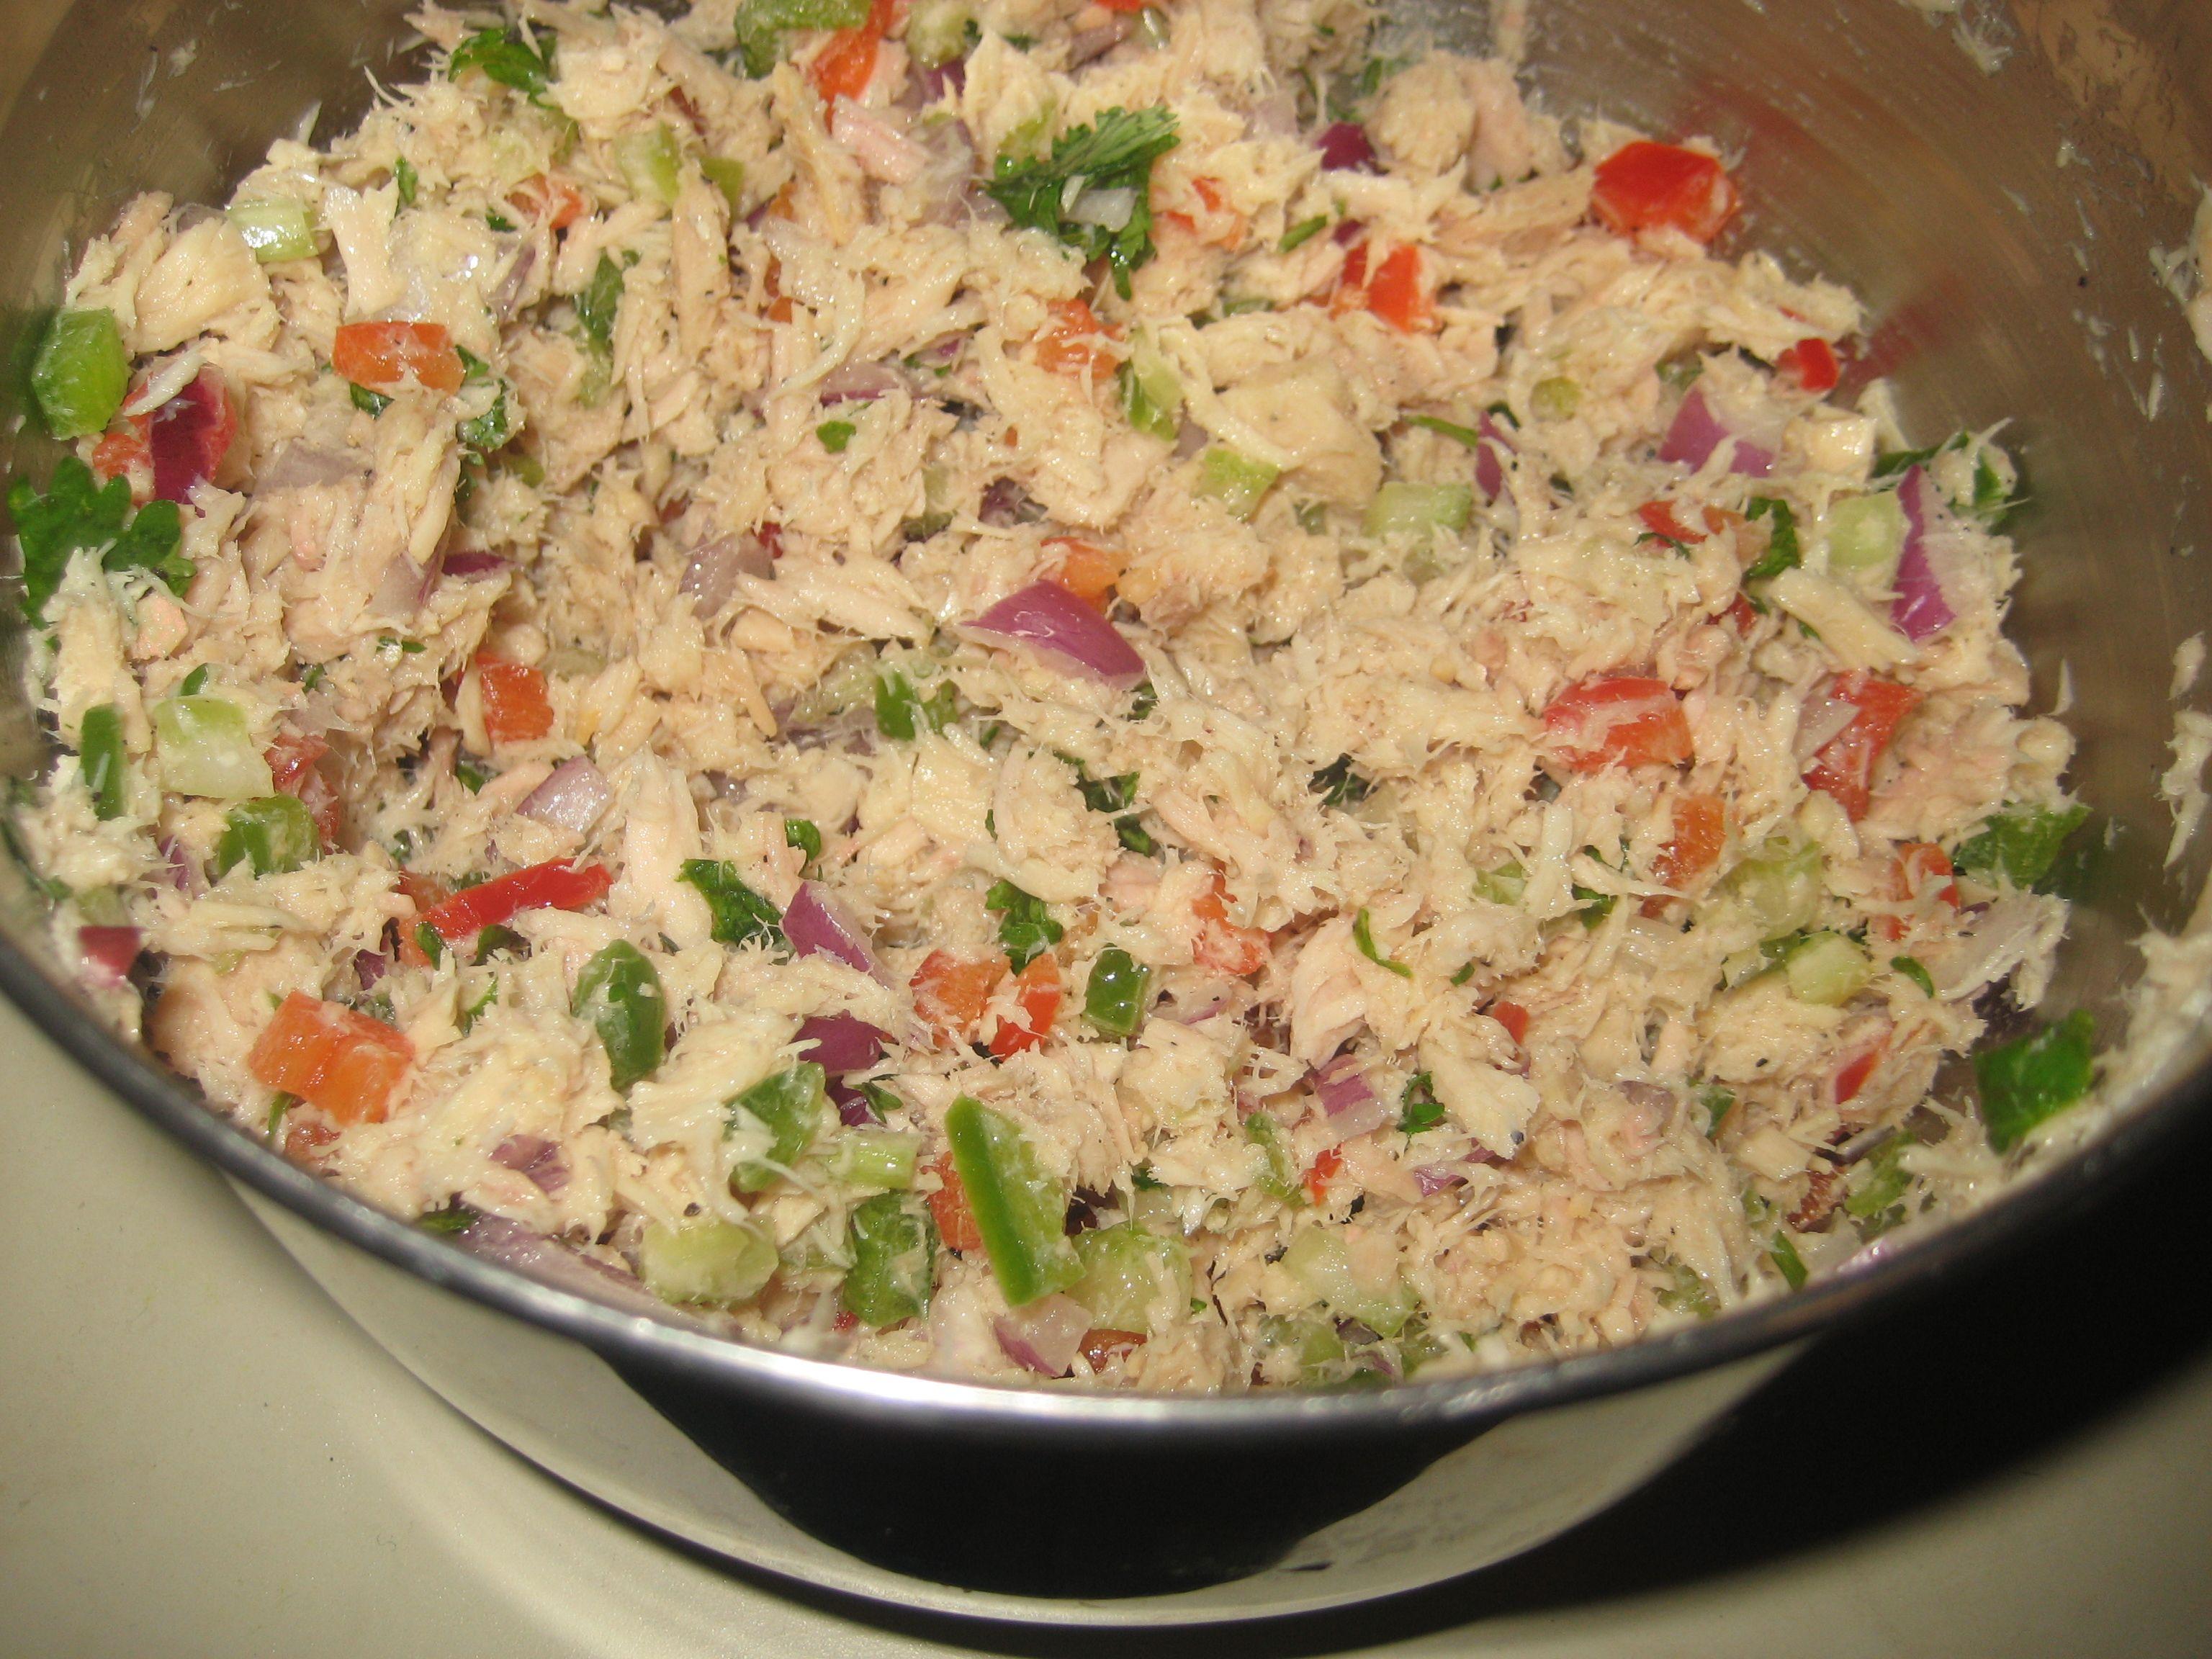 Image detail for italian style tuna salad candida for Making tuna fish